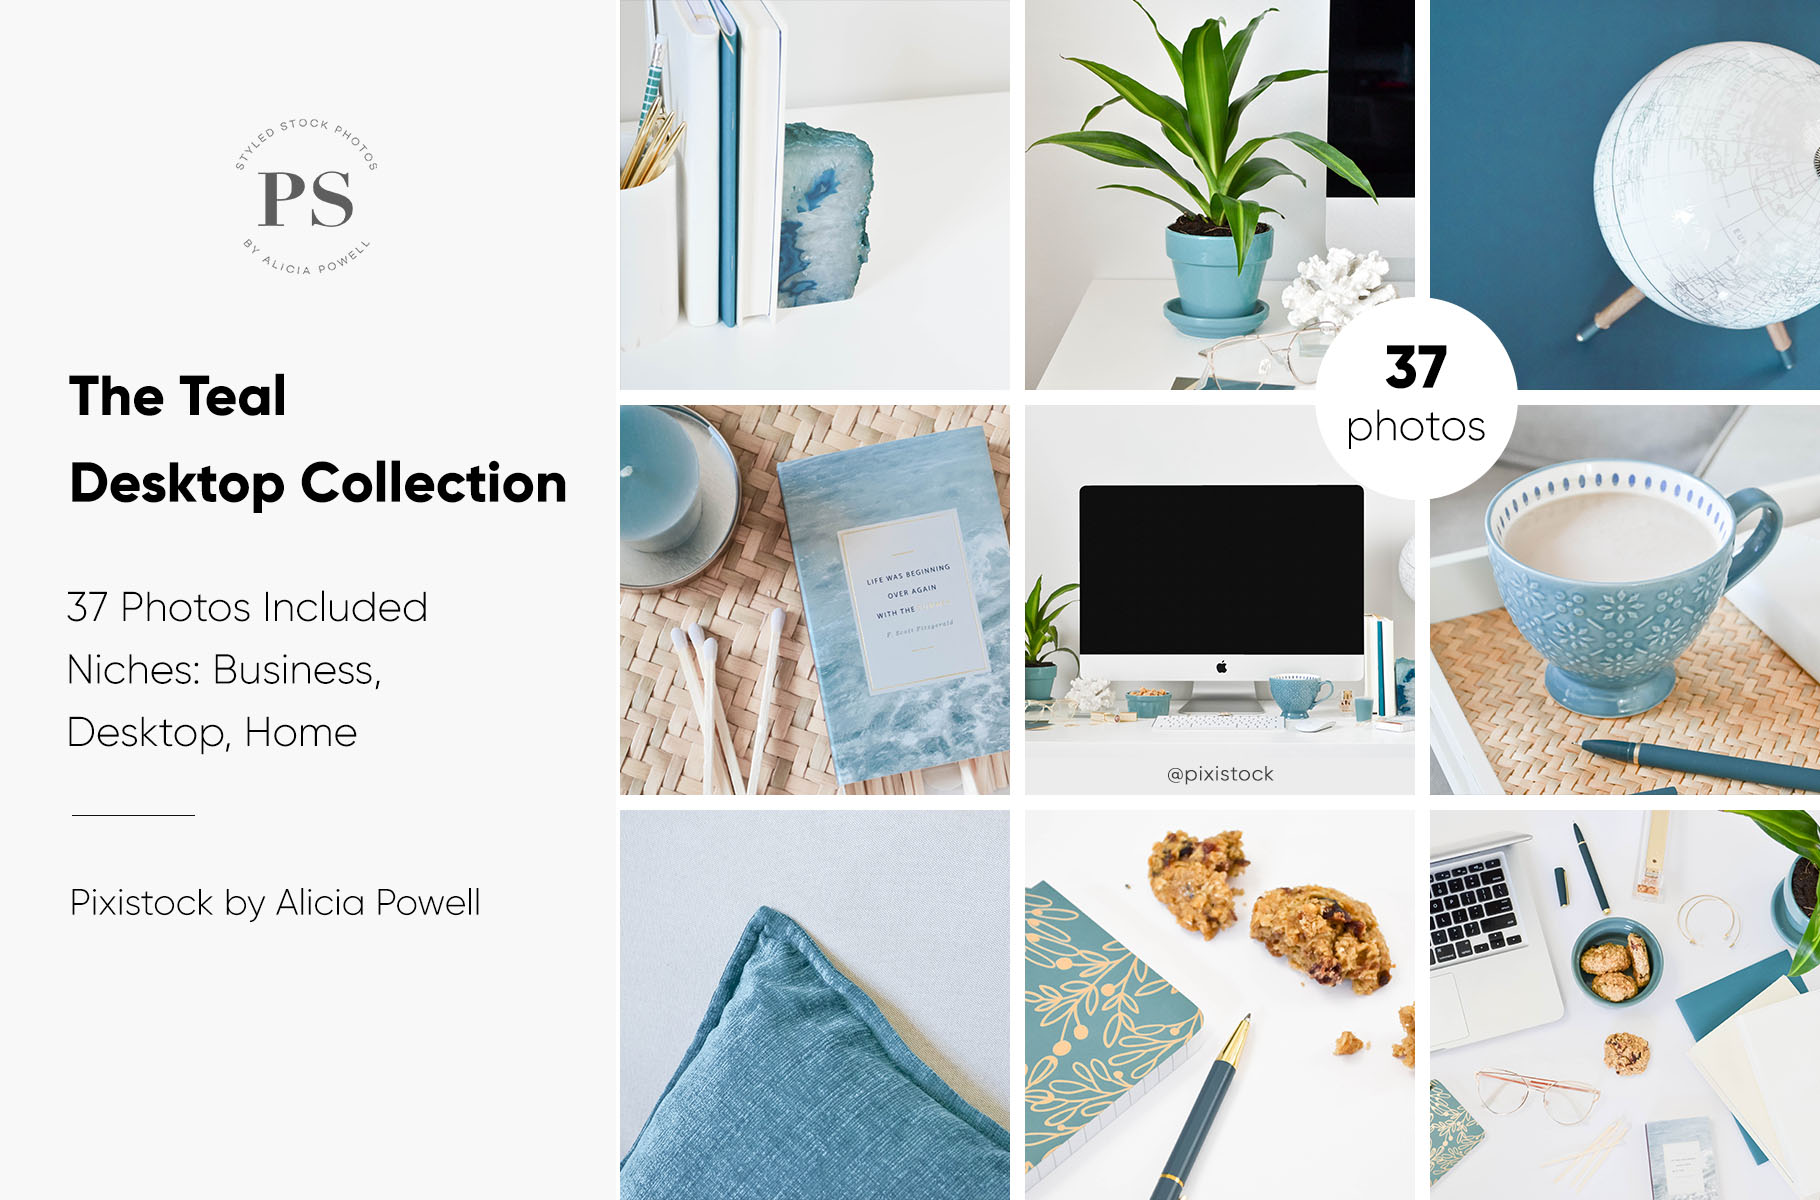 Teal Desktop Stock Photo Collection